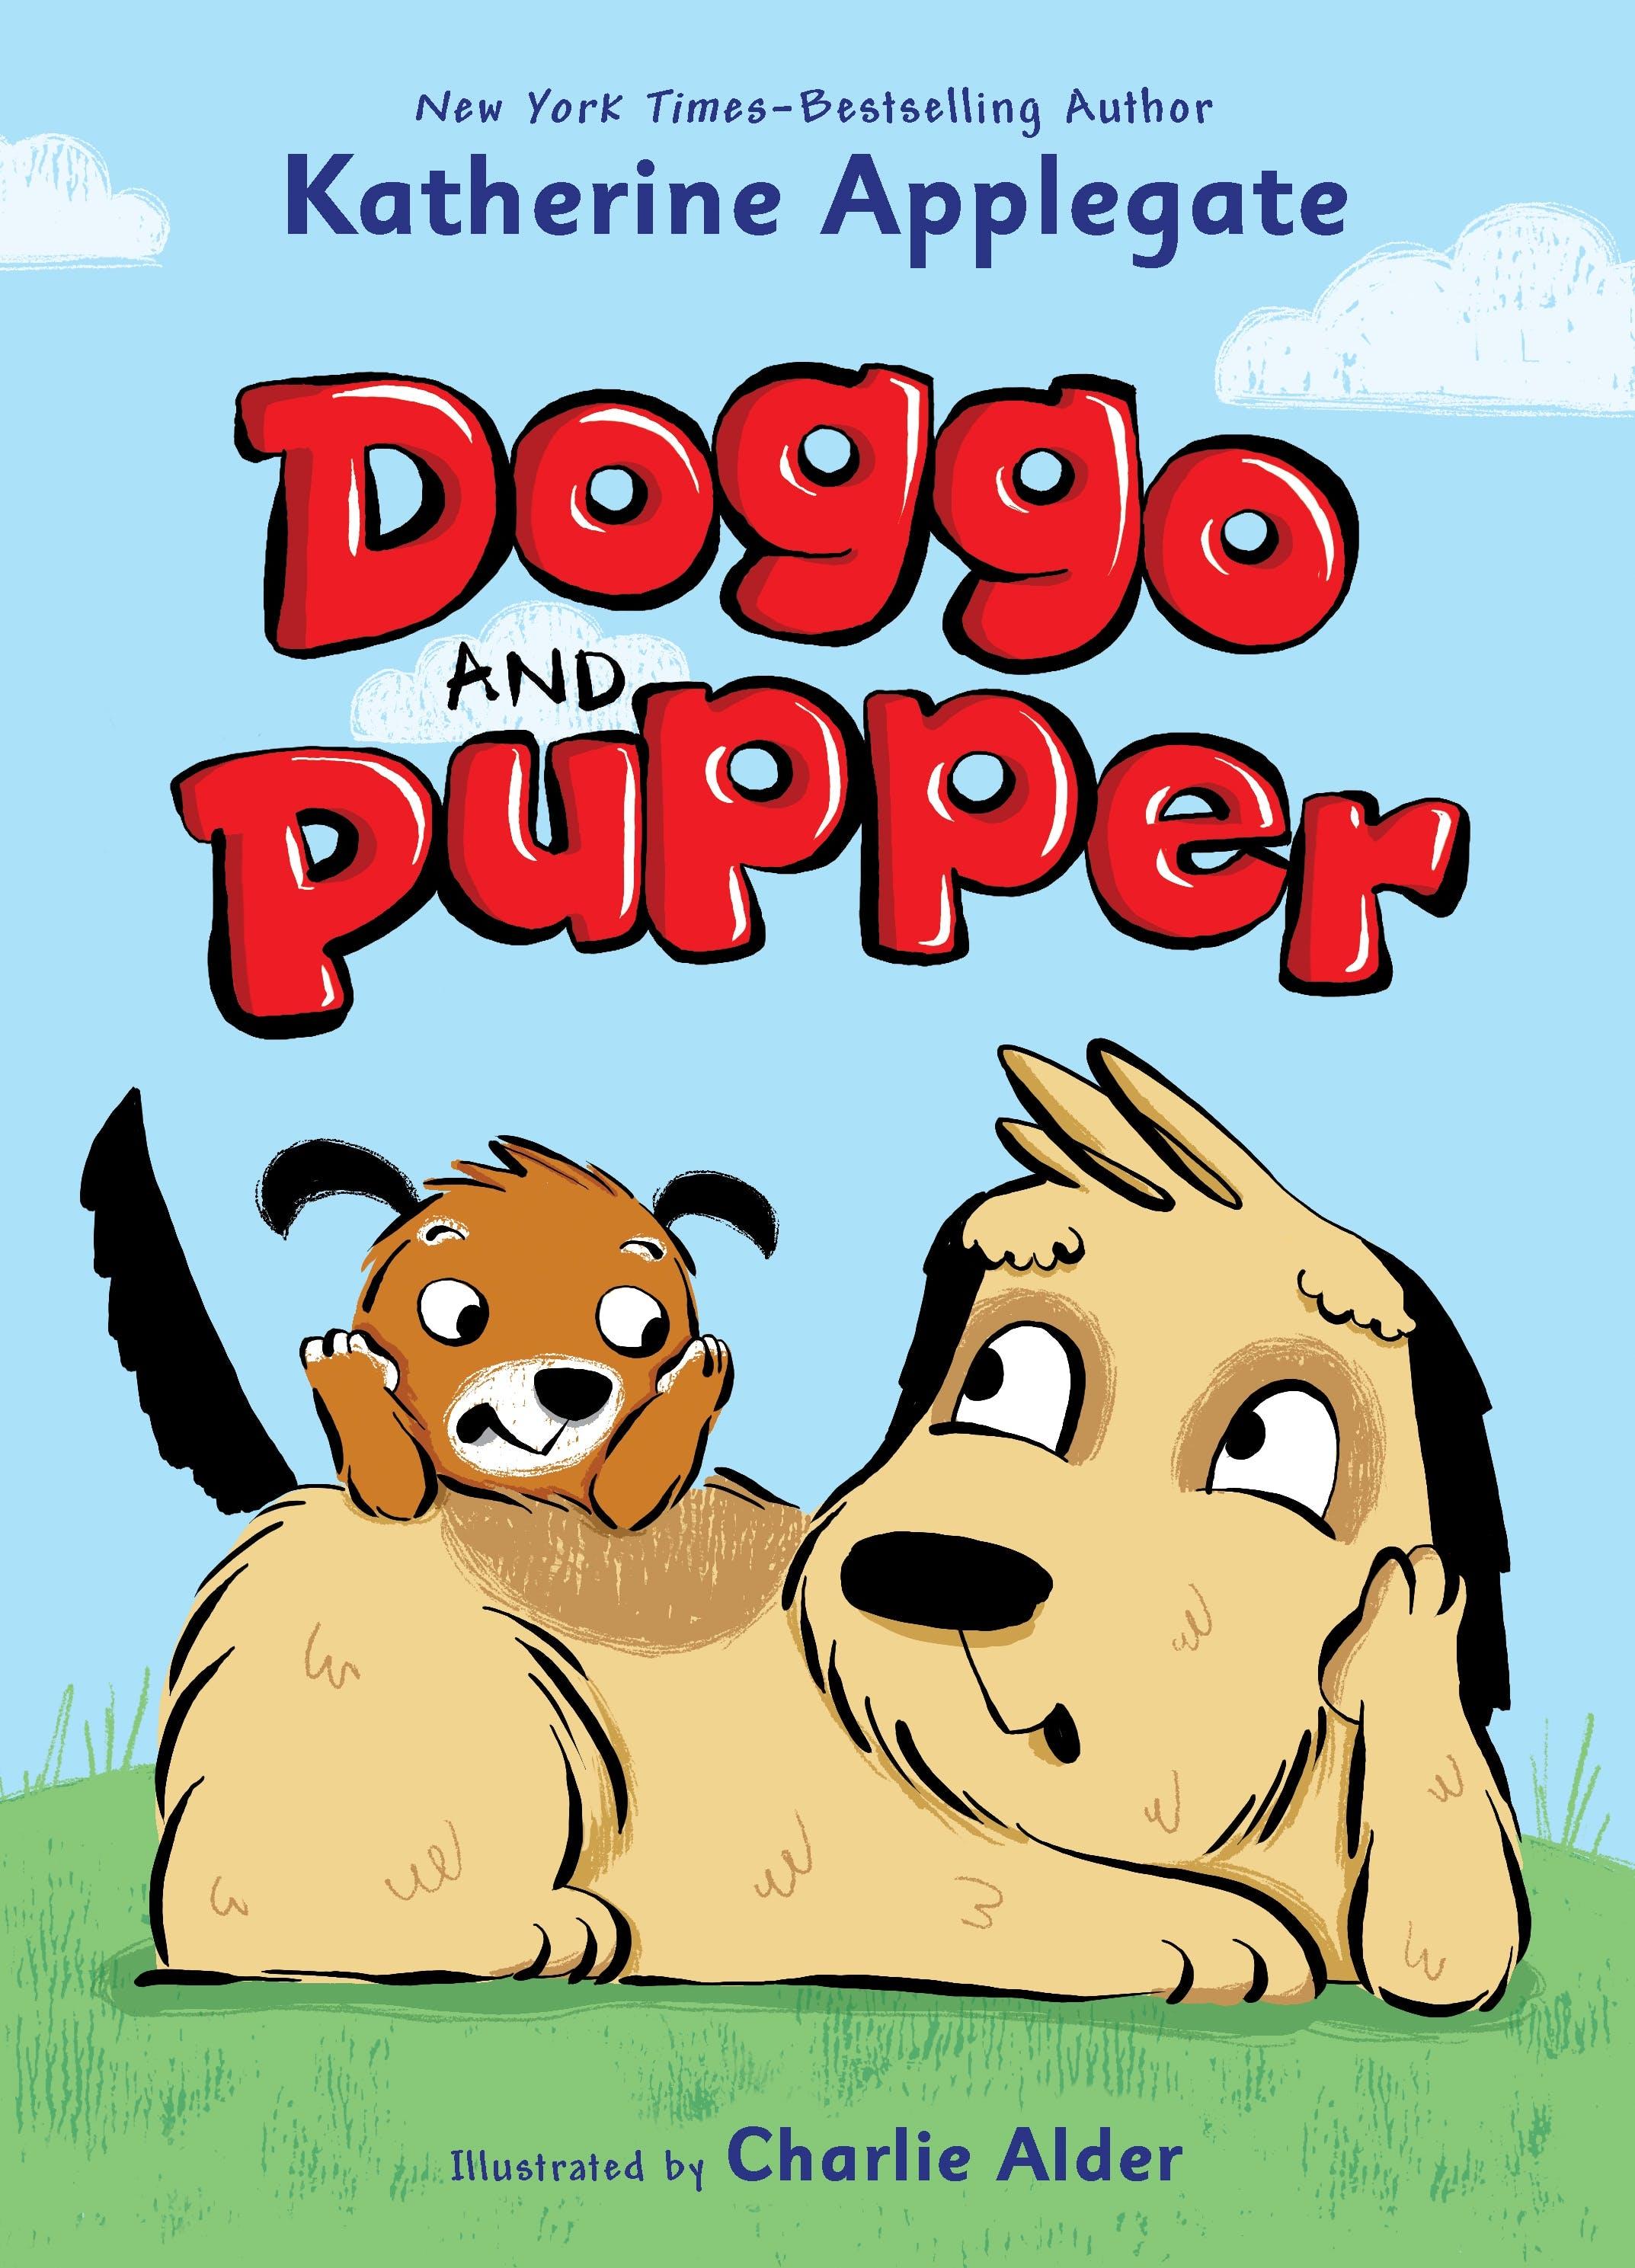 Image of Doggo and Pupper